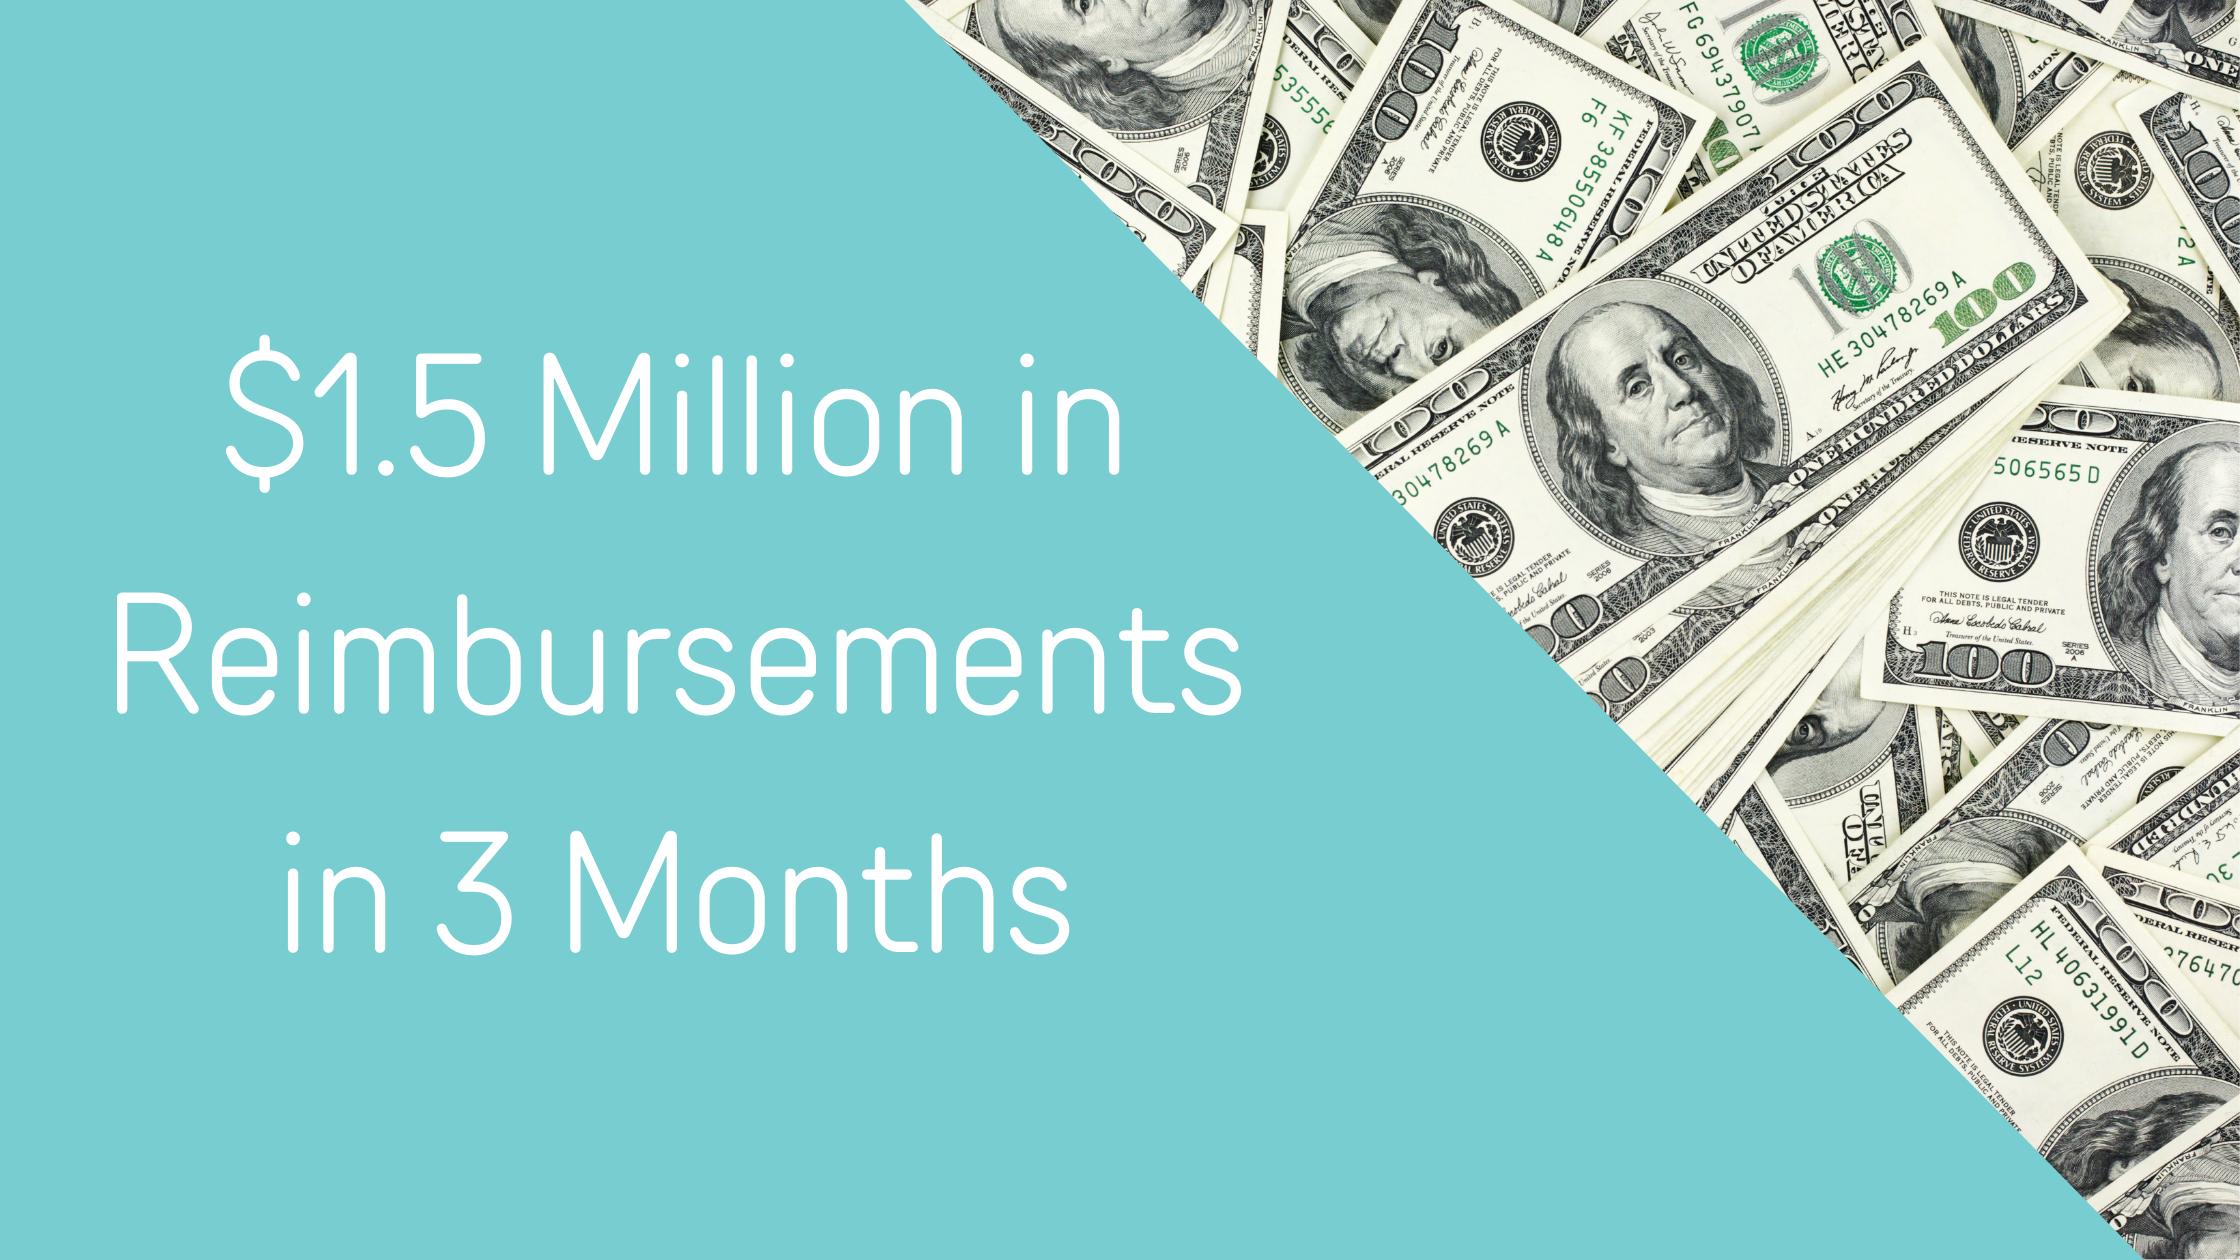 $1.5 Million in Reimbursements in 3 Months